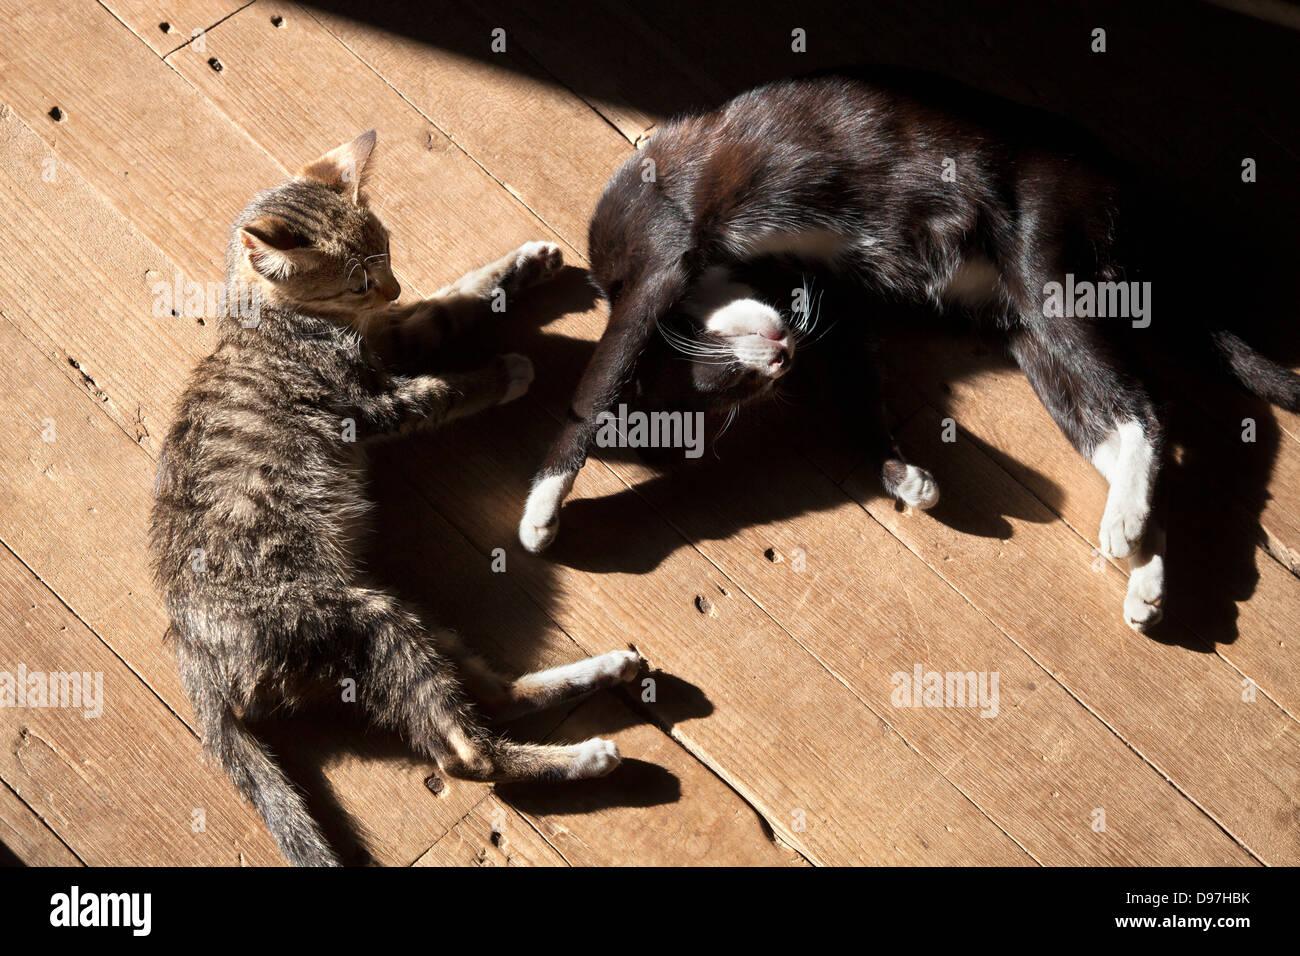 Dozing cats at the Nga Phe Kyaung jumping cat monastery, Myanmar 2 - Stock Image